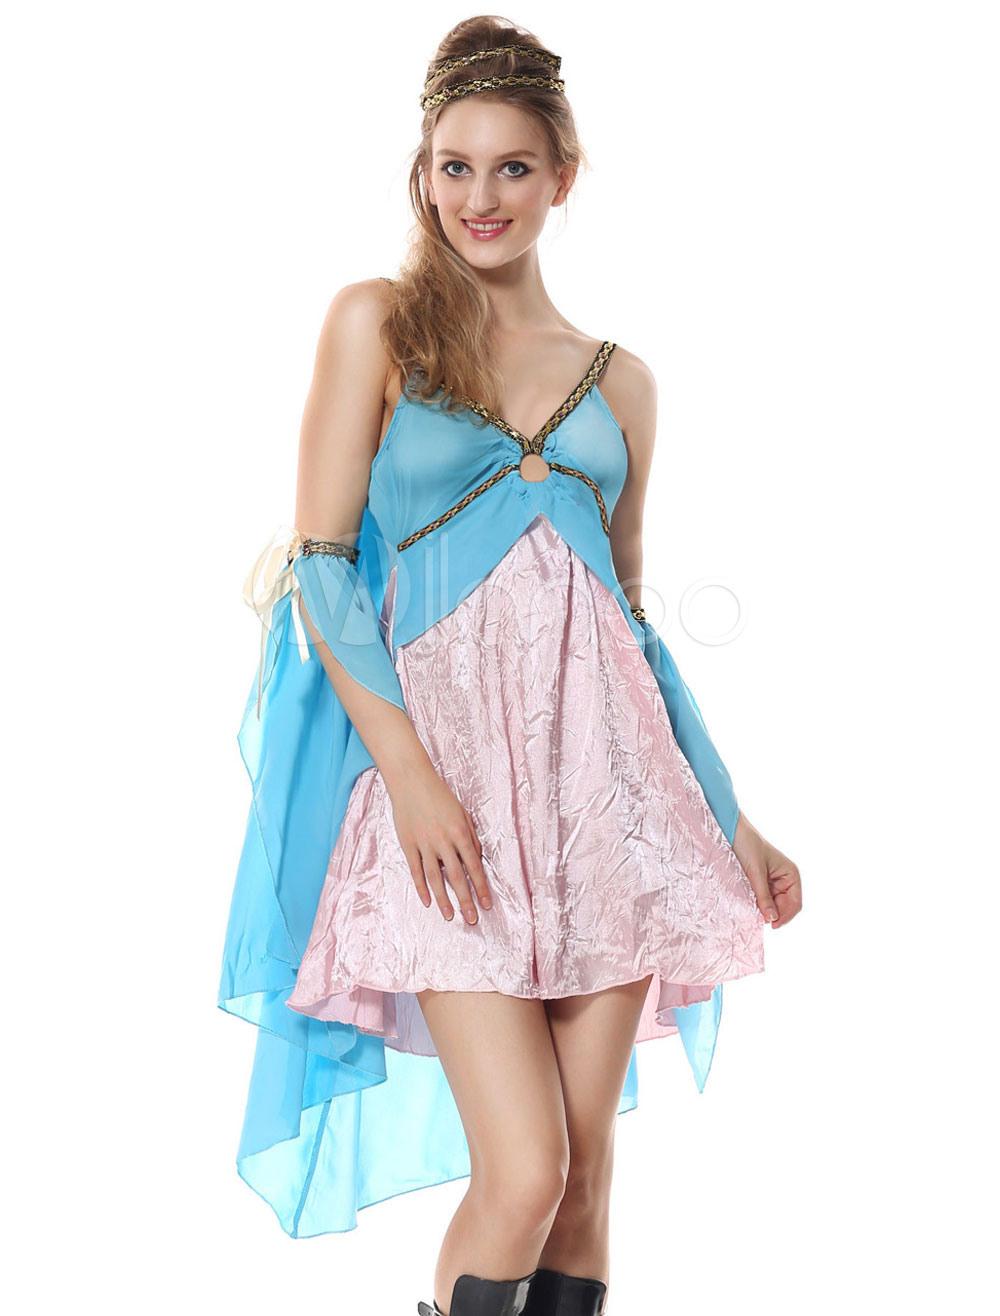 Formal Top Abendkleider Jungfrau Stylish17 Spektakulär Abendkleider Jungfrau für 2019